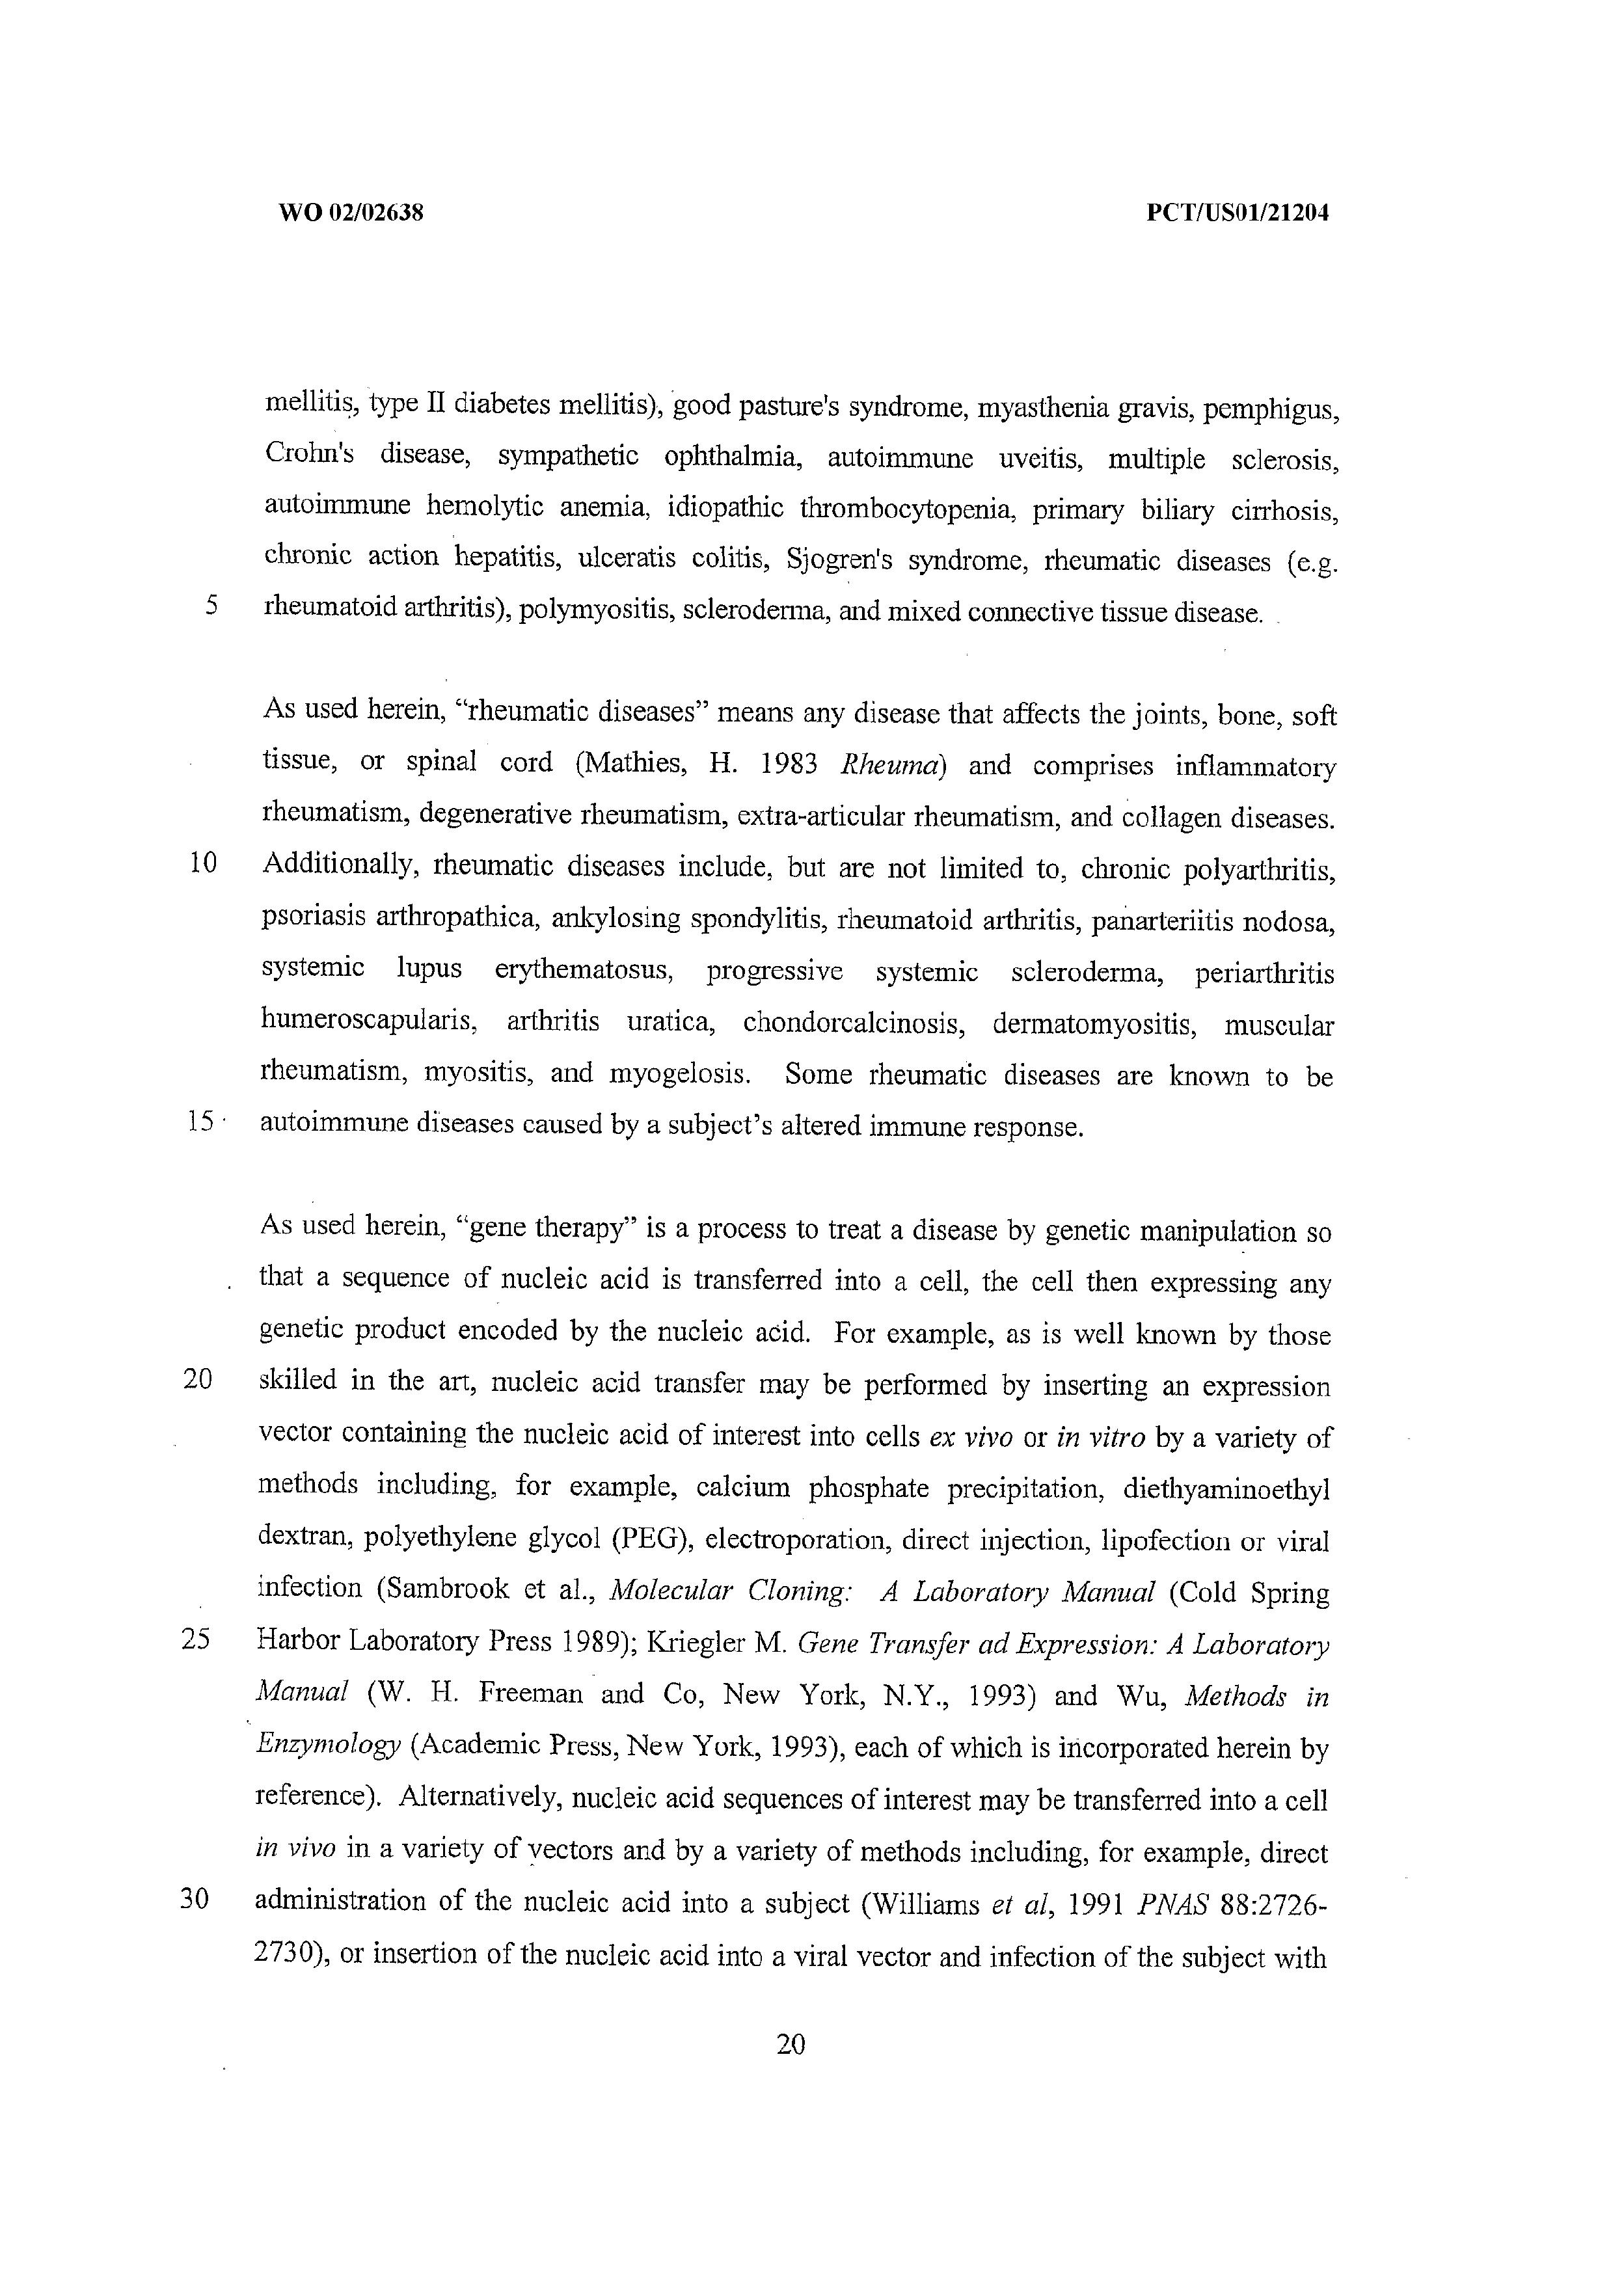 Au 2001273174 B2 Methods For Treating Rheumatic Diseases Using A